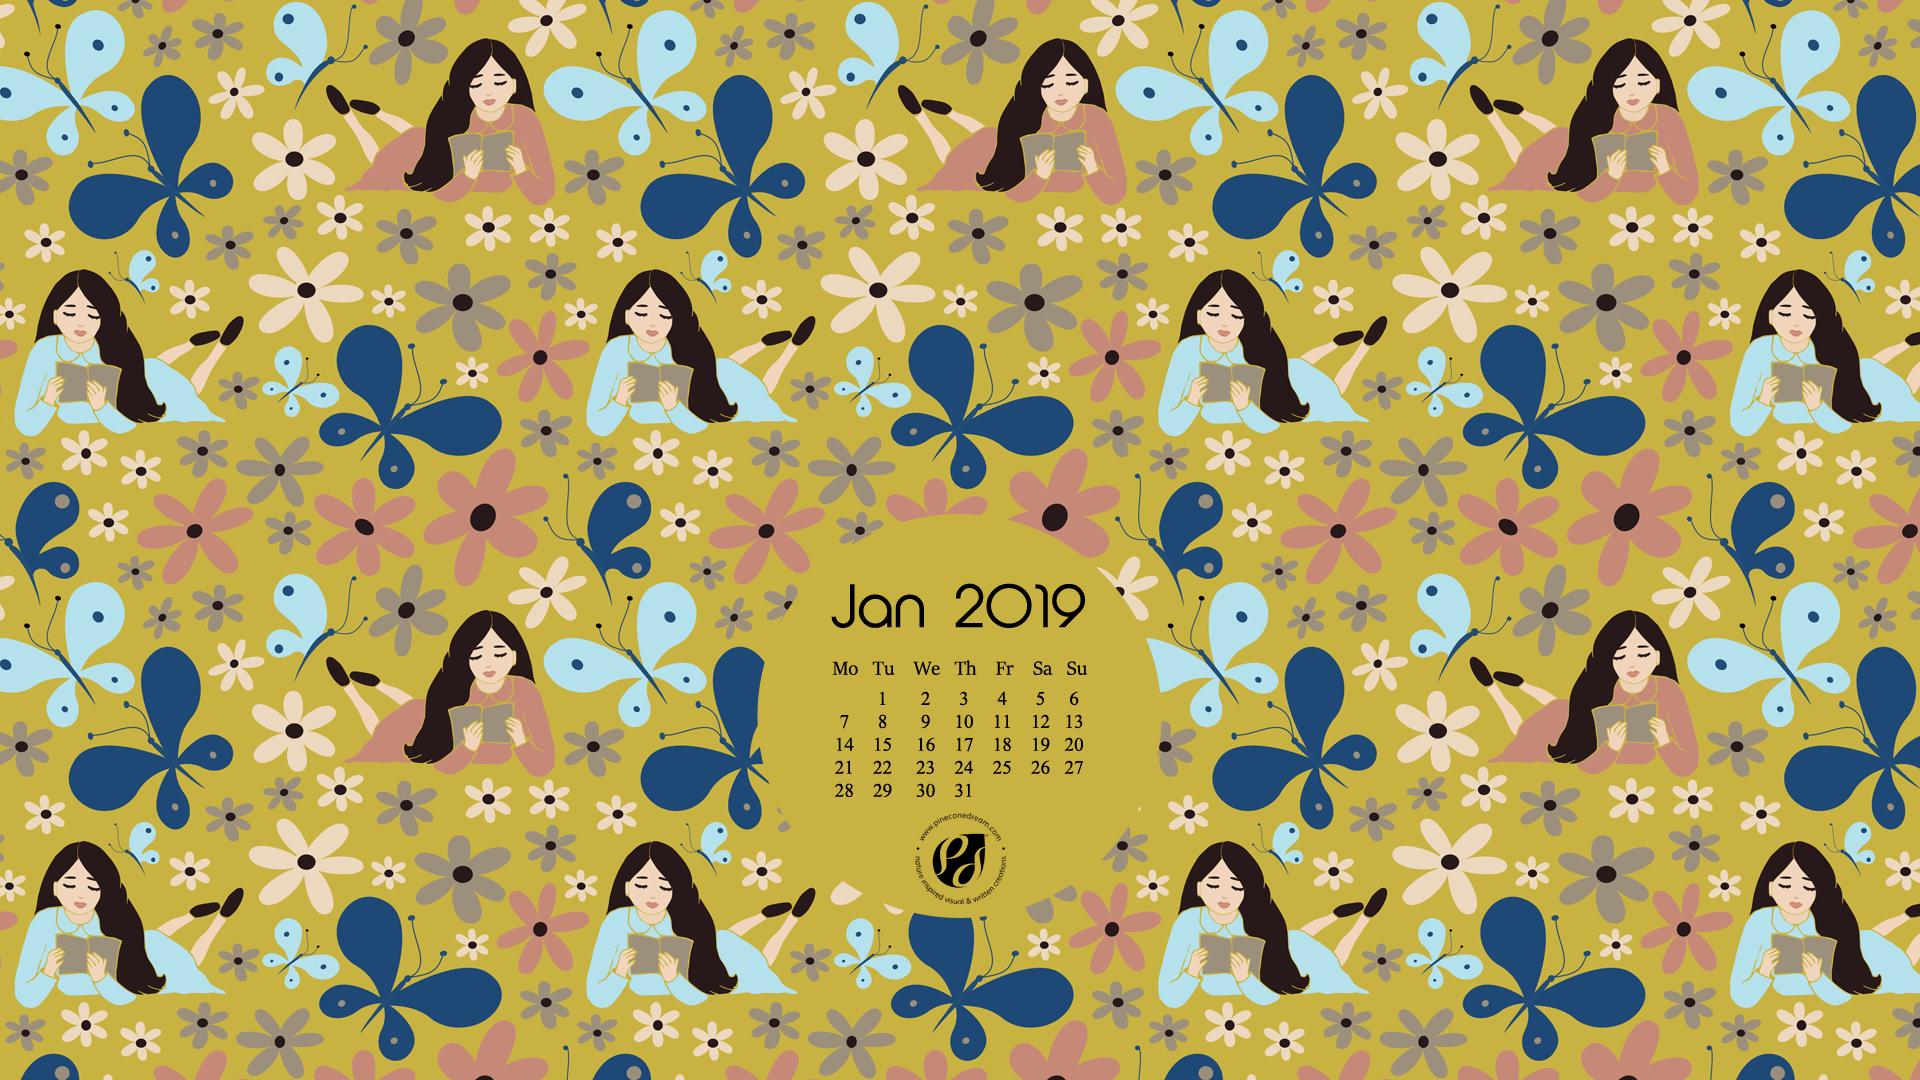 Illustrated desktop calendar background Jan 2019